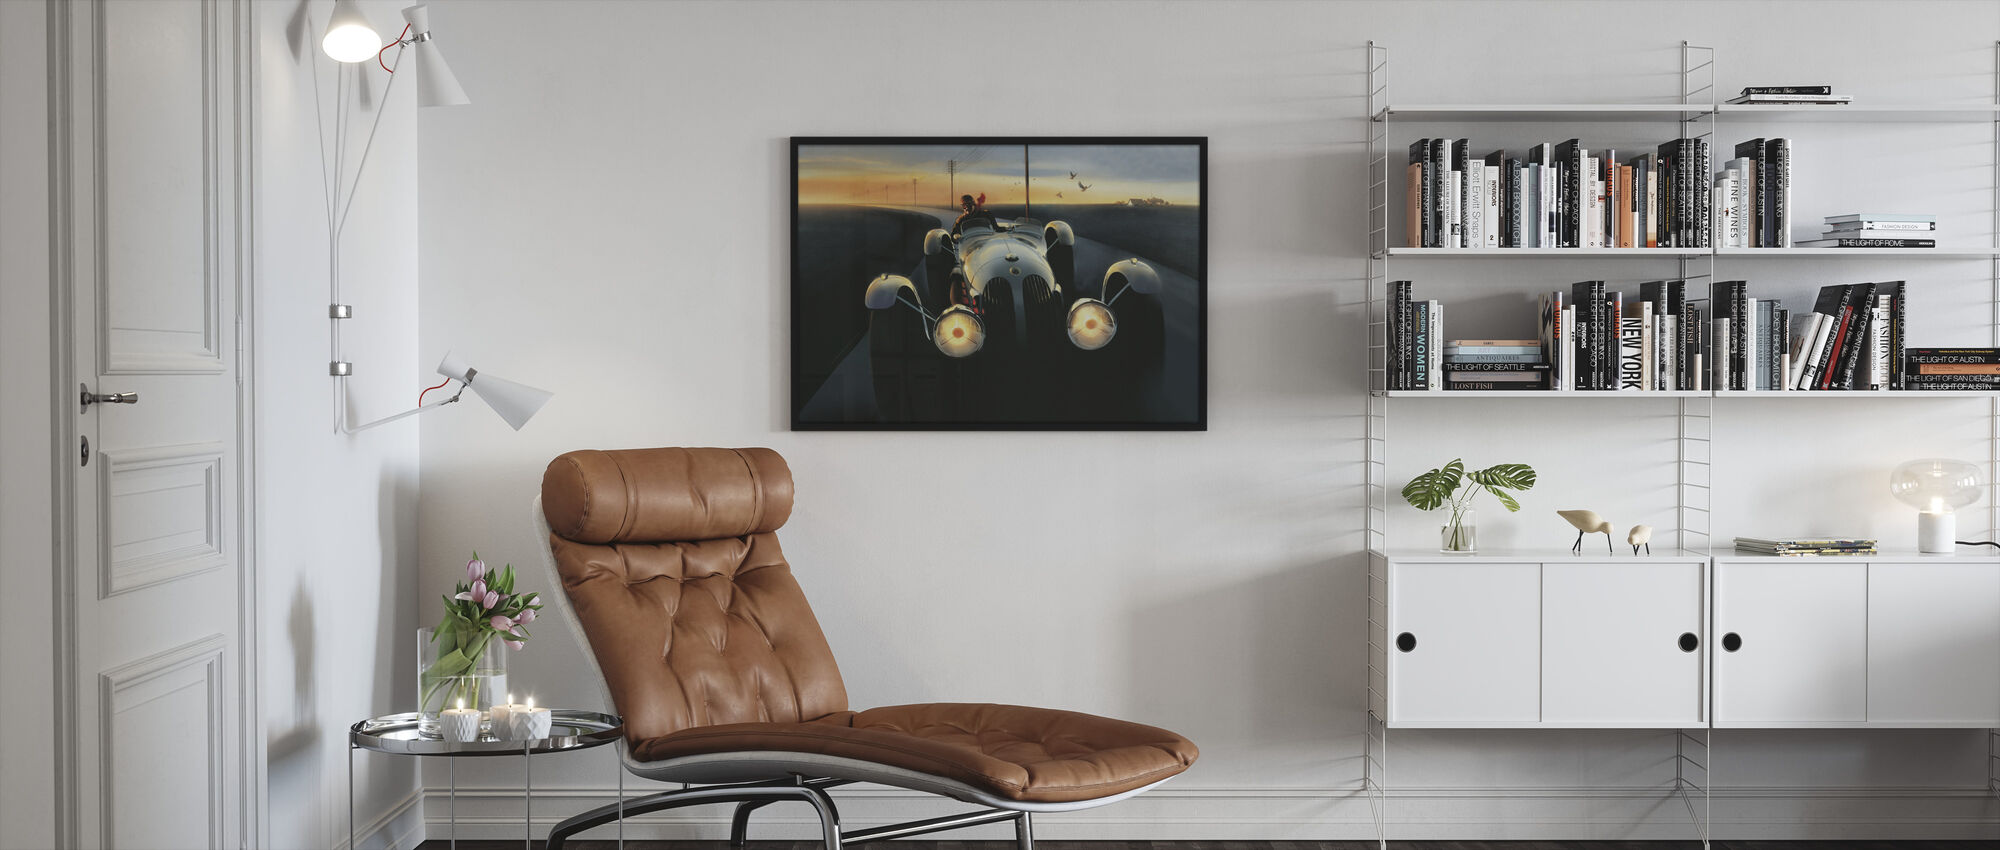 Templars Hirondel - Framed print - Living Room